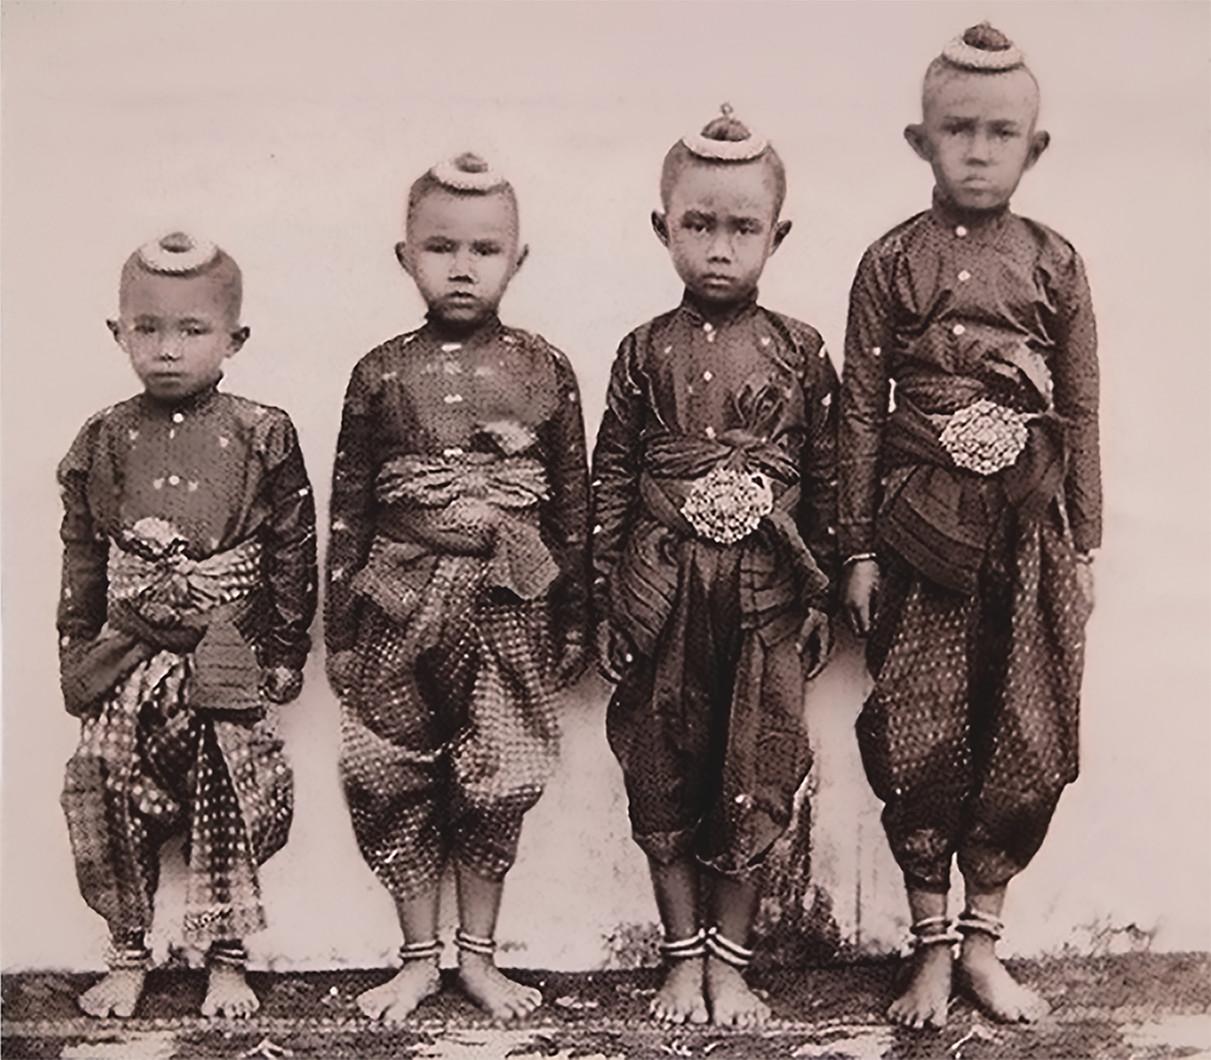 Thai Style Studio 1984 ทรงผมเด็กไทยในสมัยโบราณ / ความเชื่อกับทรงผม 1